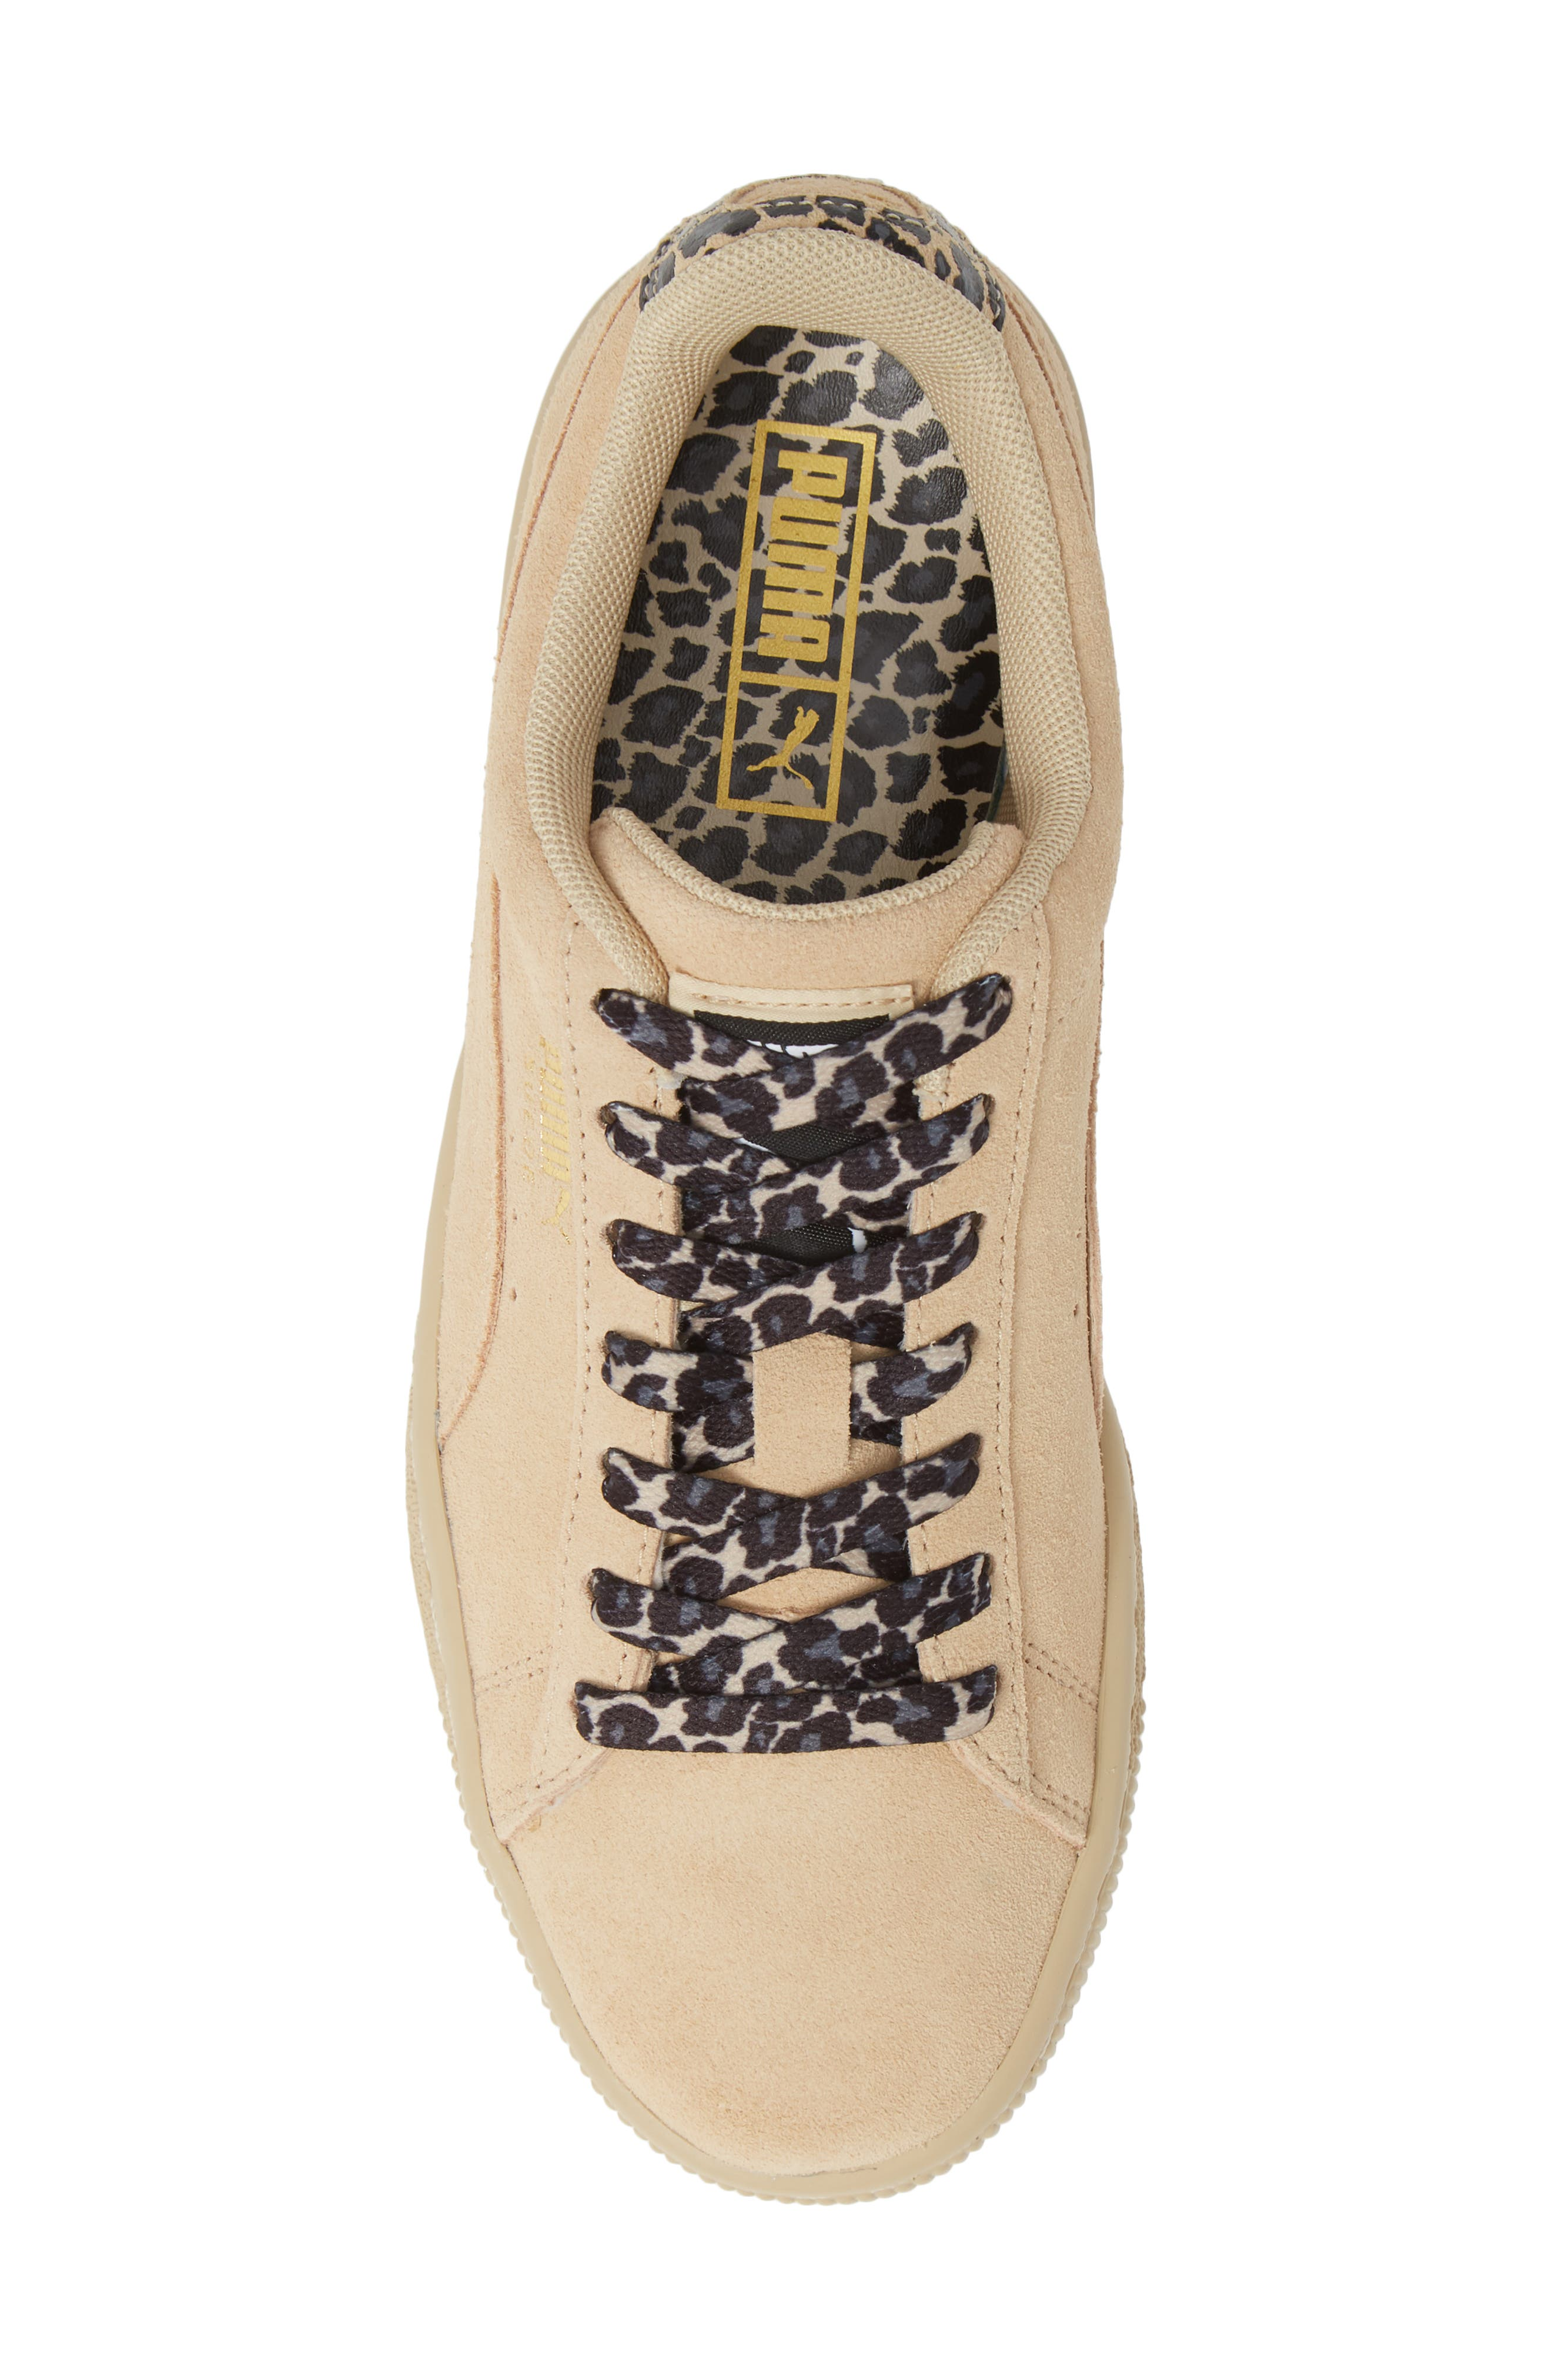 Suede Wild Sneaker,                             Alternate thumbnail 5, color,                             BLACK/ TEAM GOLD/ PEBBLE